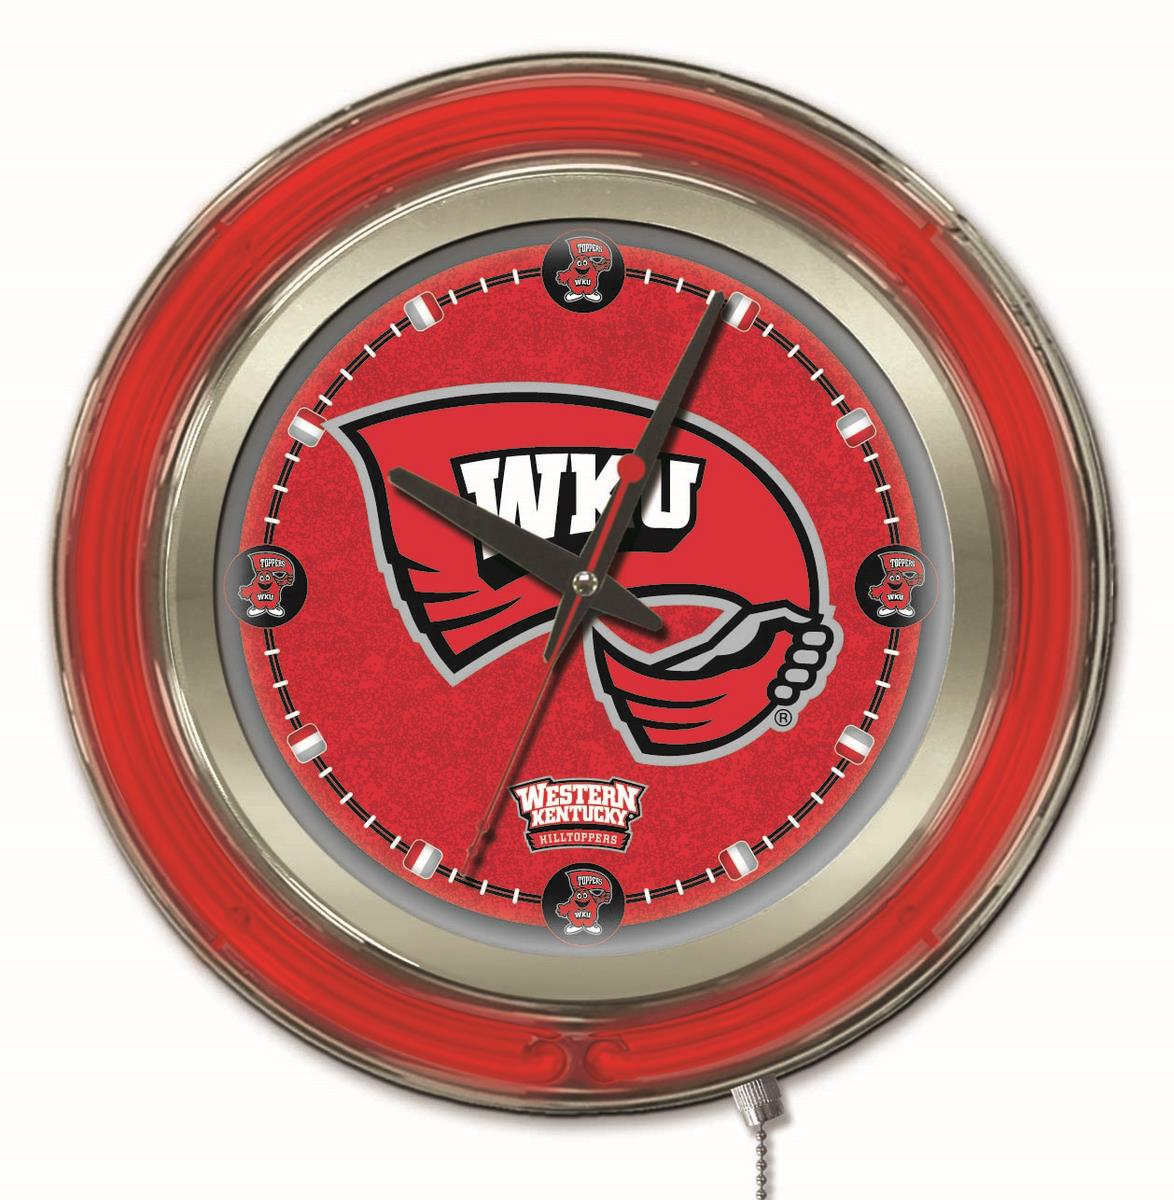 Western Kentucky Double Neon Ring 15quot dia Logo Clock  : Clk15WestKy from zerbee.com size 1174 x 1200 jpeg 173kB